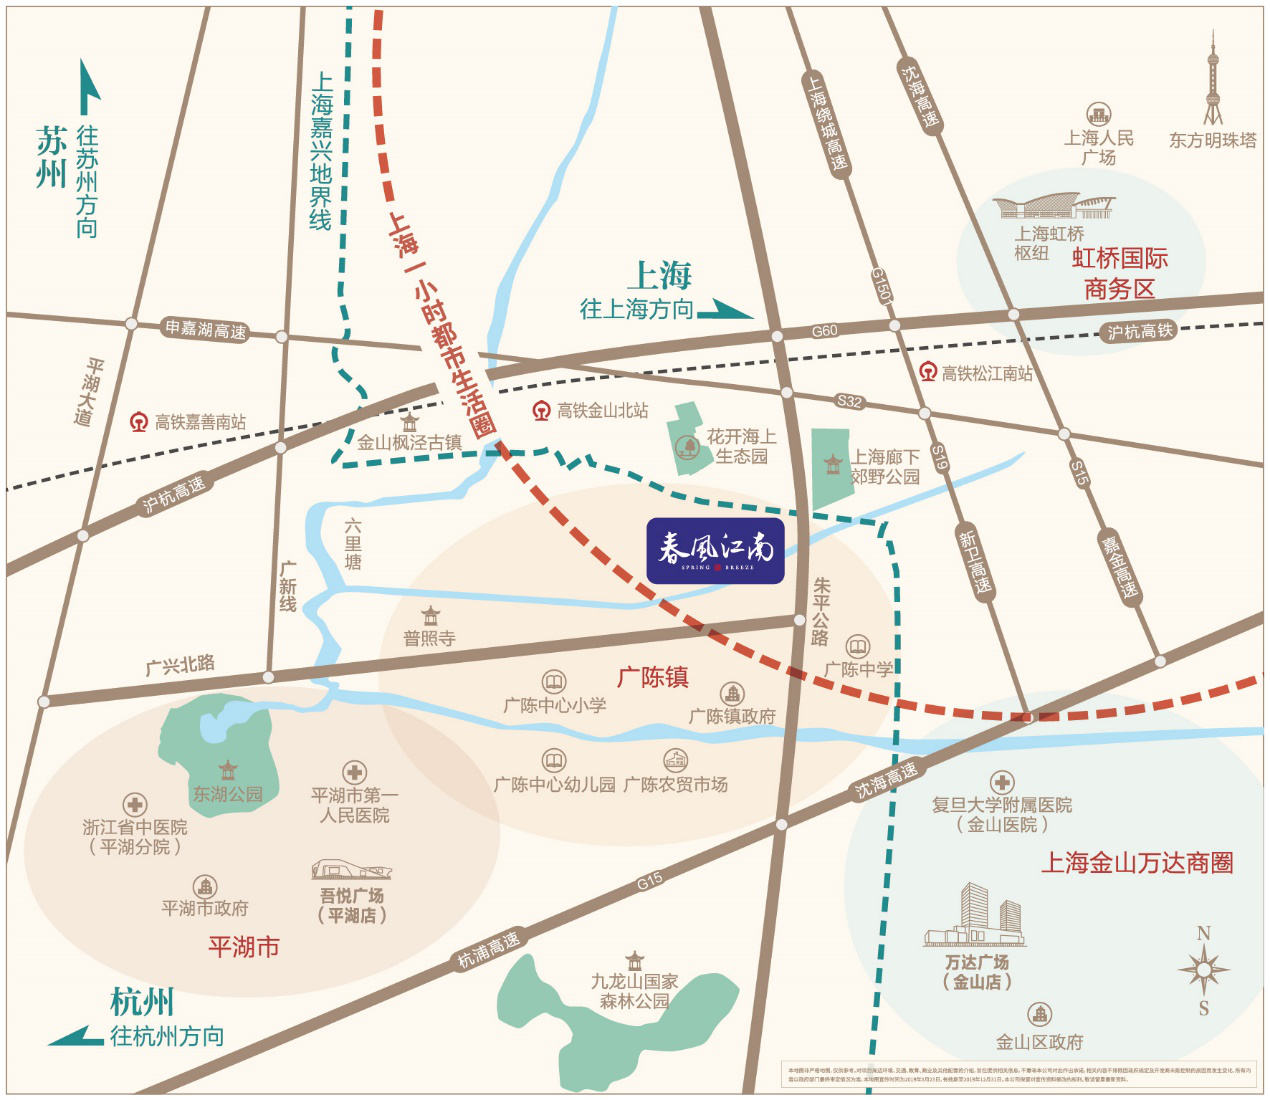 区域图片2.png